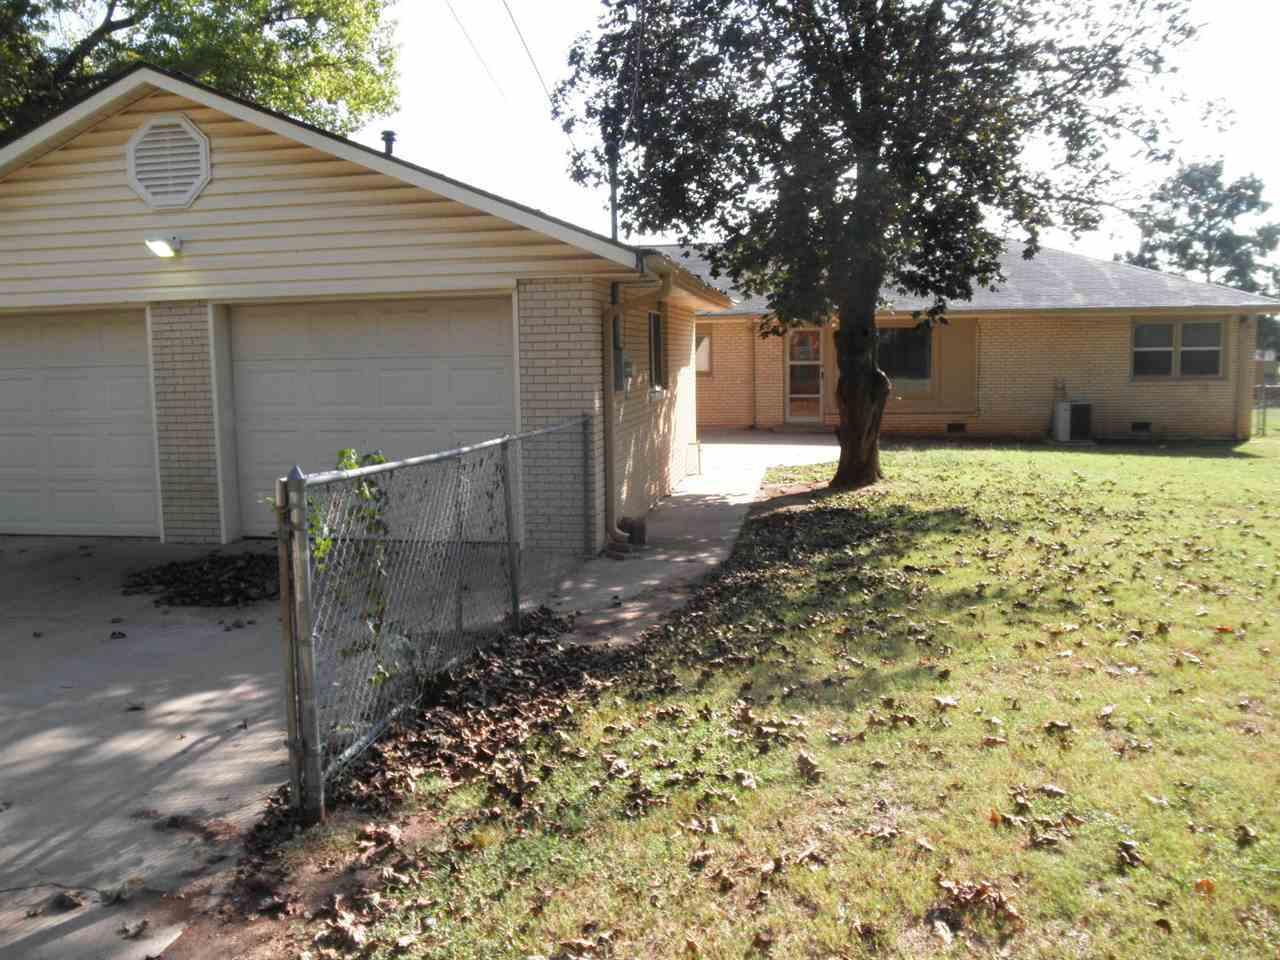 Sold Cross Sale W/ MLS | 204 N 13th  Ponca City, OK 74601 30